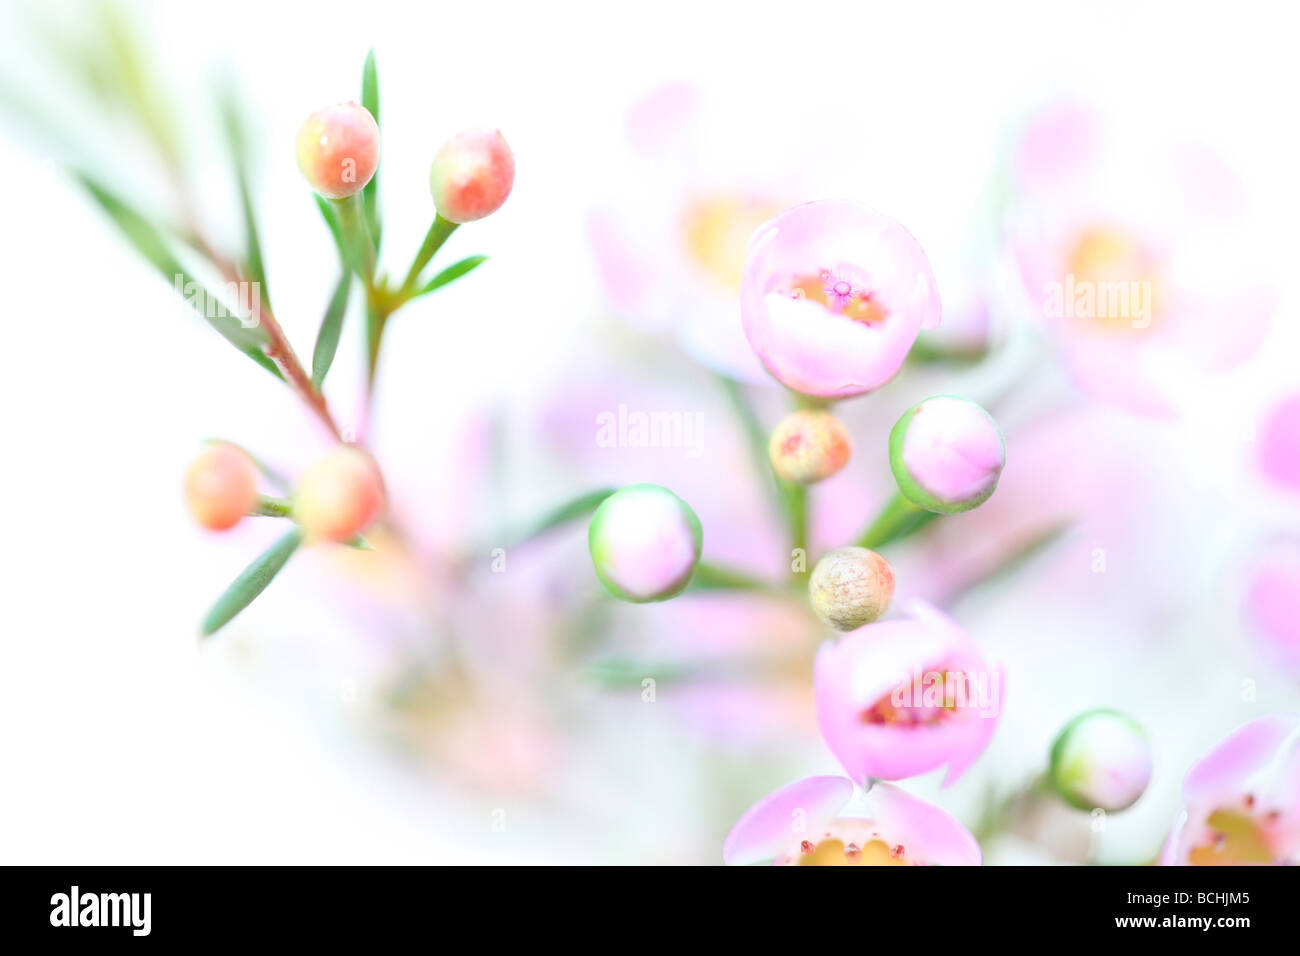 charming pink wax flower on white fine art photography Jane Ann Butler Photography JABP404 - Stock Image